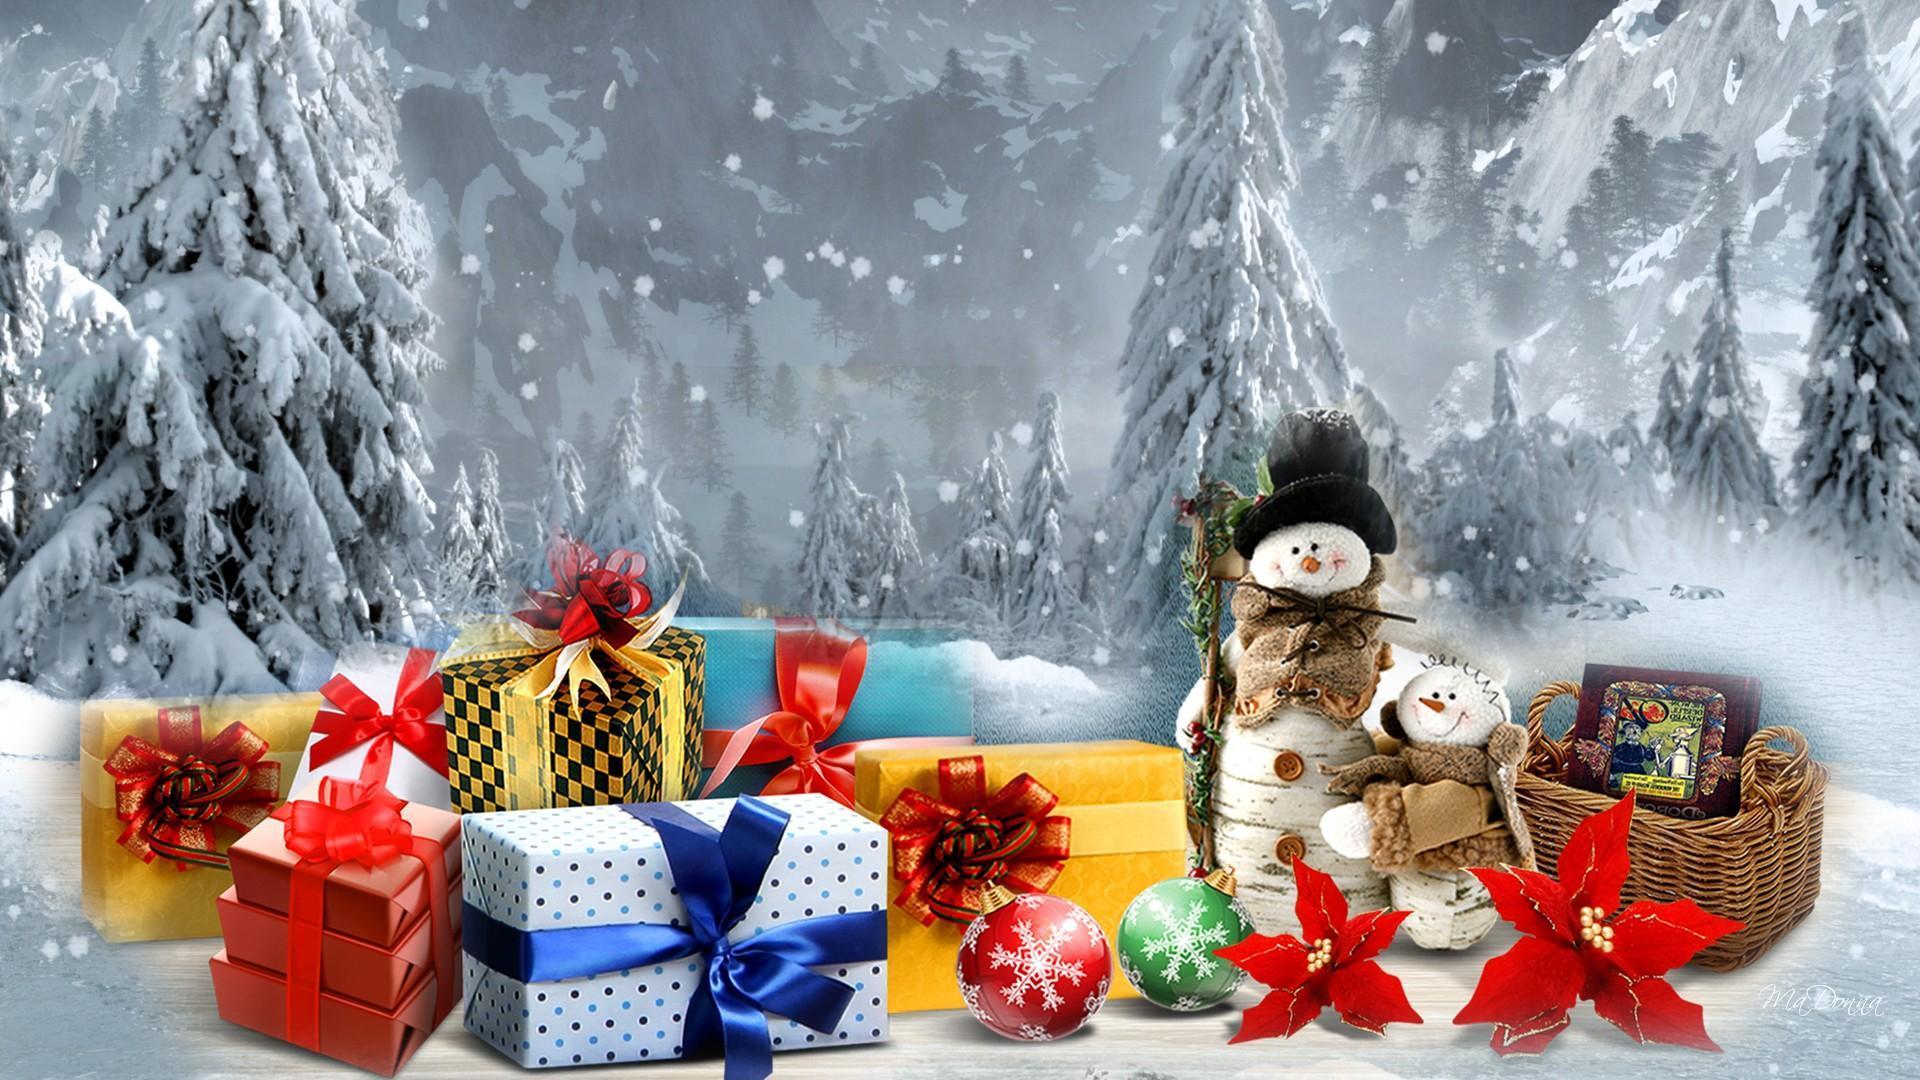 Free Animated 3d Wallpaper Christmas Time Winter Time Hd Desktop Wallpaper